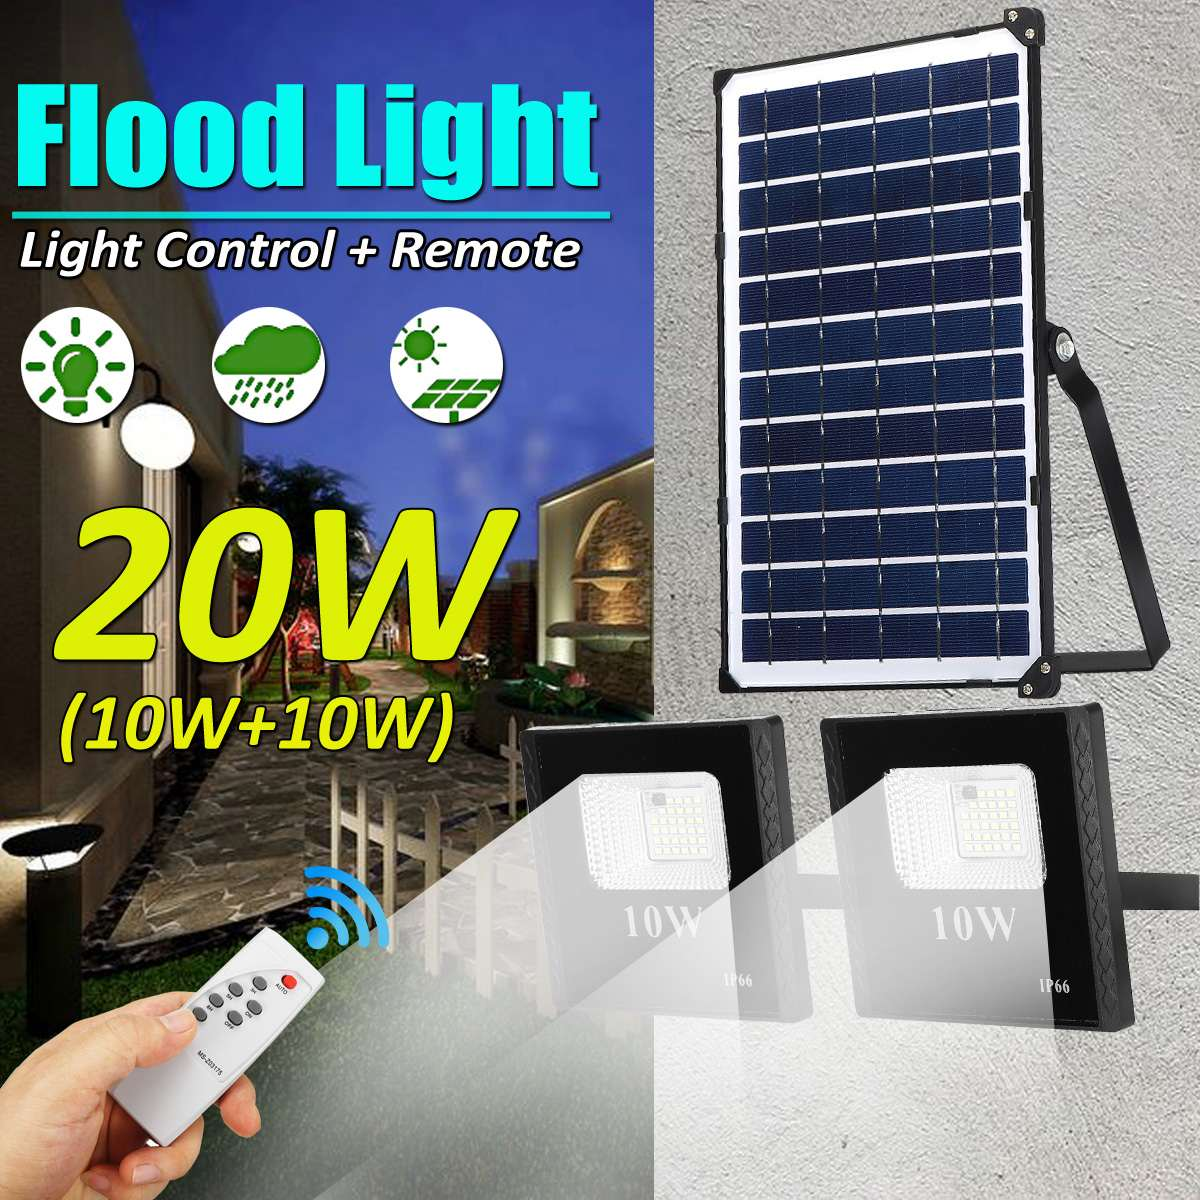 Solar Floodlight 32/64 Led Portable Spotlight floodlight Outdoor Street Garden Light Waterproof Wall Lamp with Remote Control|Floodlights| |  - title=